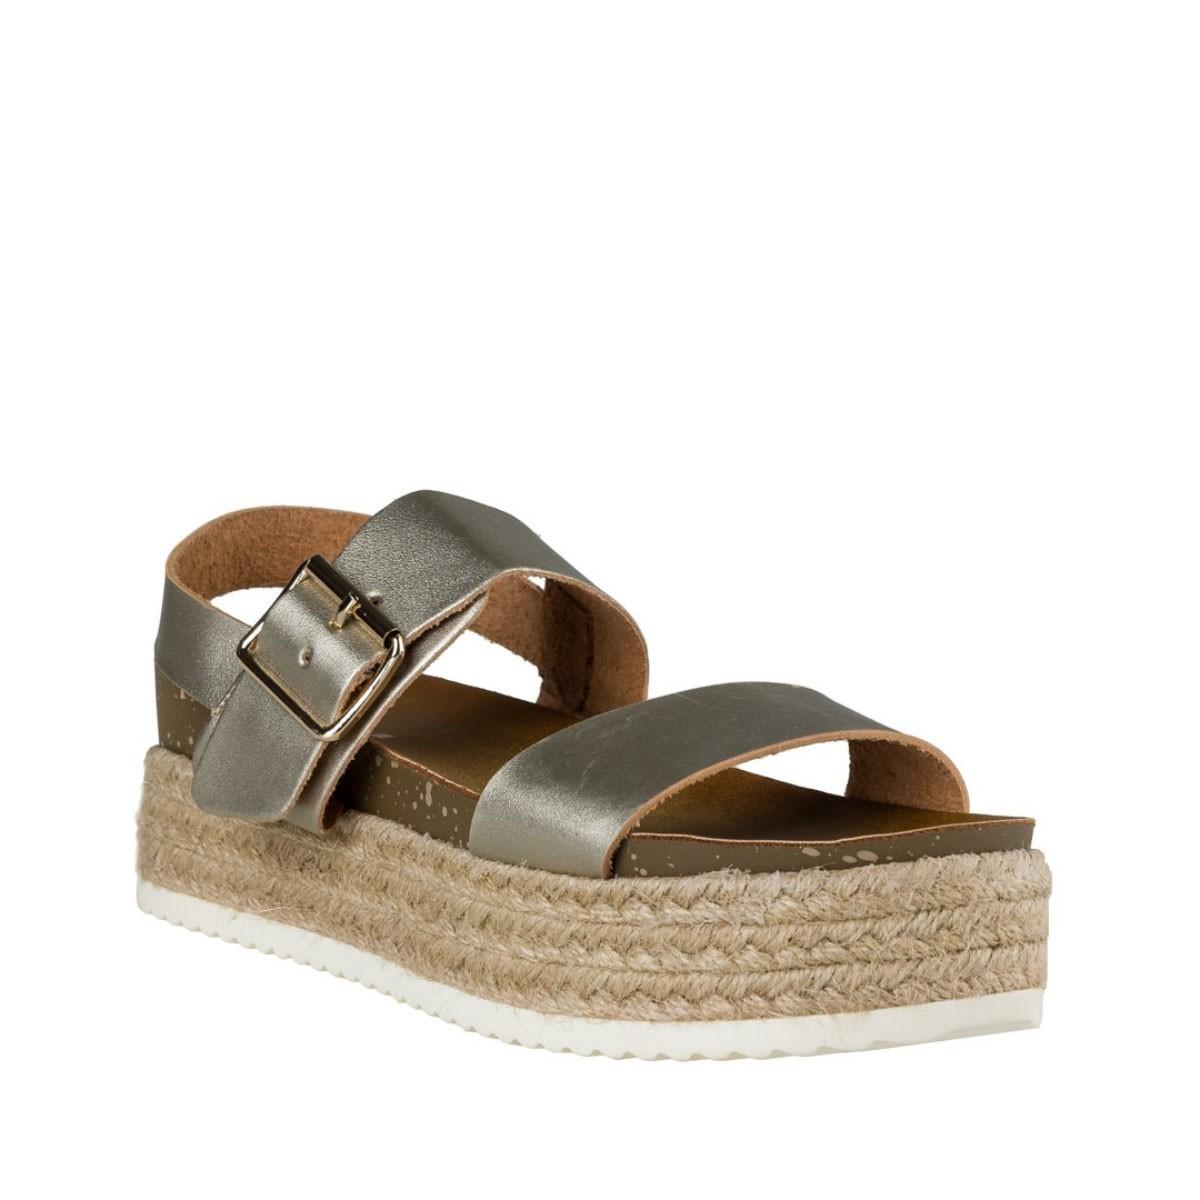 Envie Shoes Γυναικεία Παπούτσια Πέδιλα E21-05055 Χρυσό